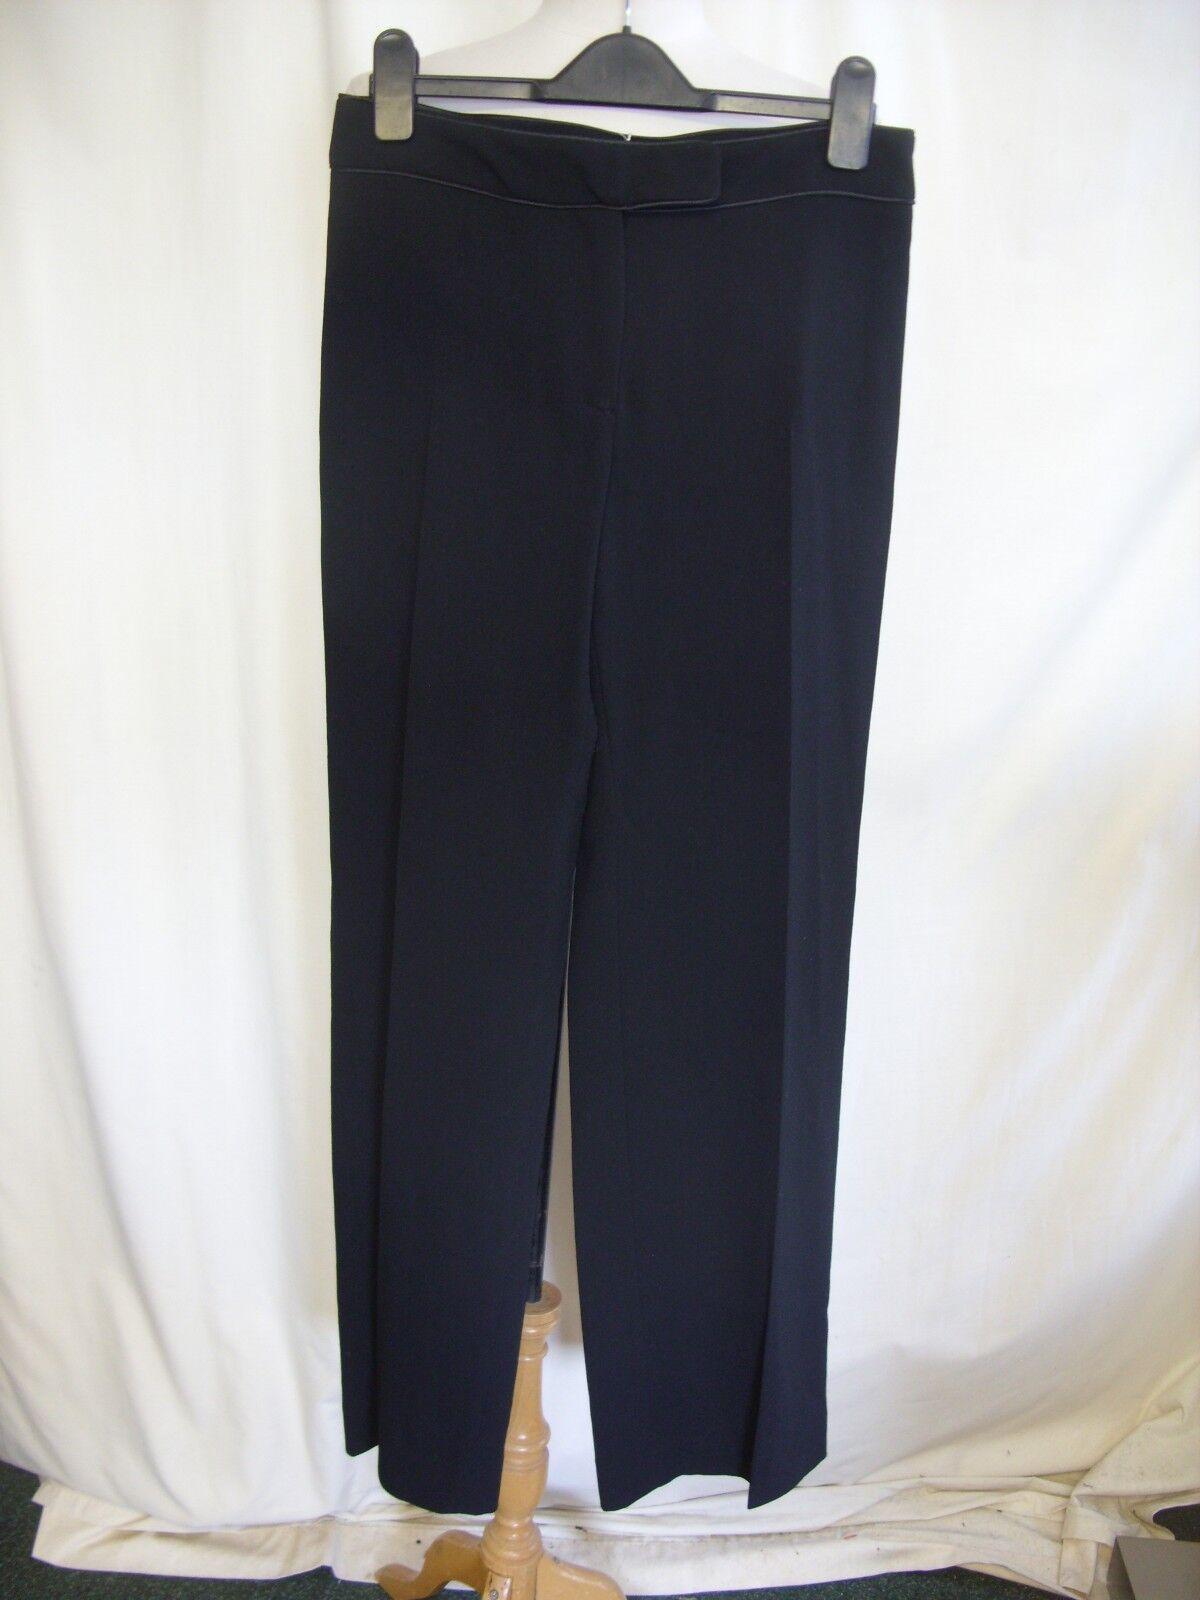 Ladies Trousers Hobbs UK 8 8 8 schwarz light wool waist 30  inside leg 33  smart 7756 7e830e